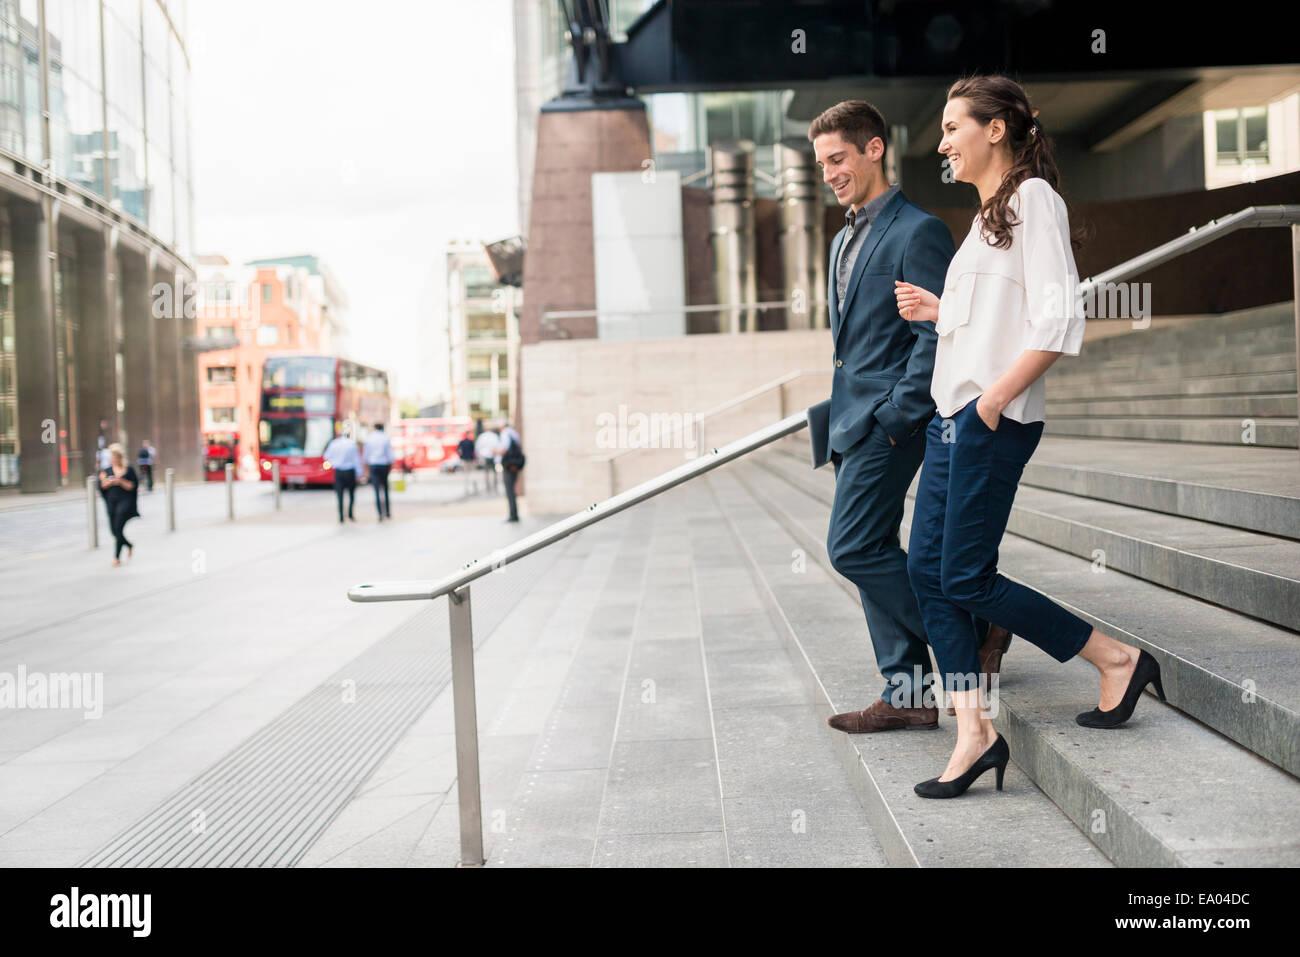 Rückansicht des jungen Geschäftsmann und Frau chatten während hinunter Treppe, London, UK Stockbild